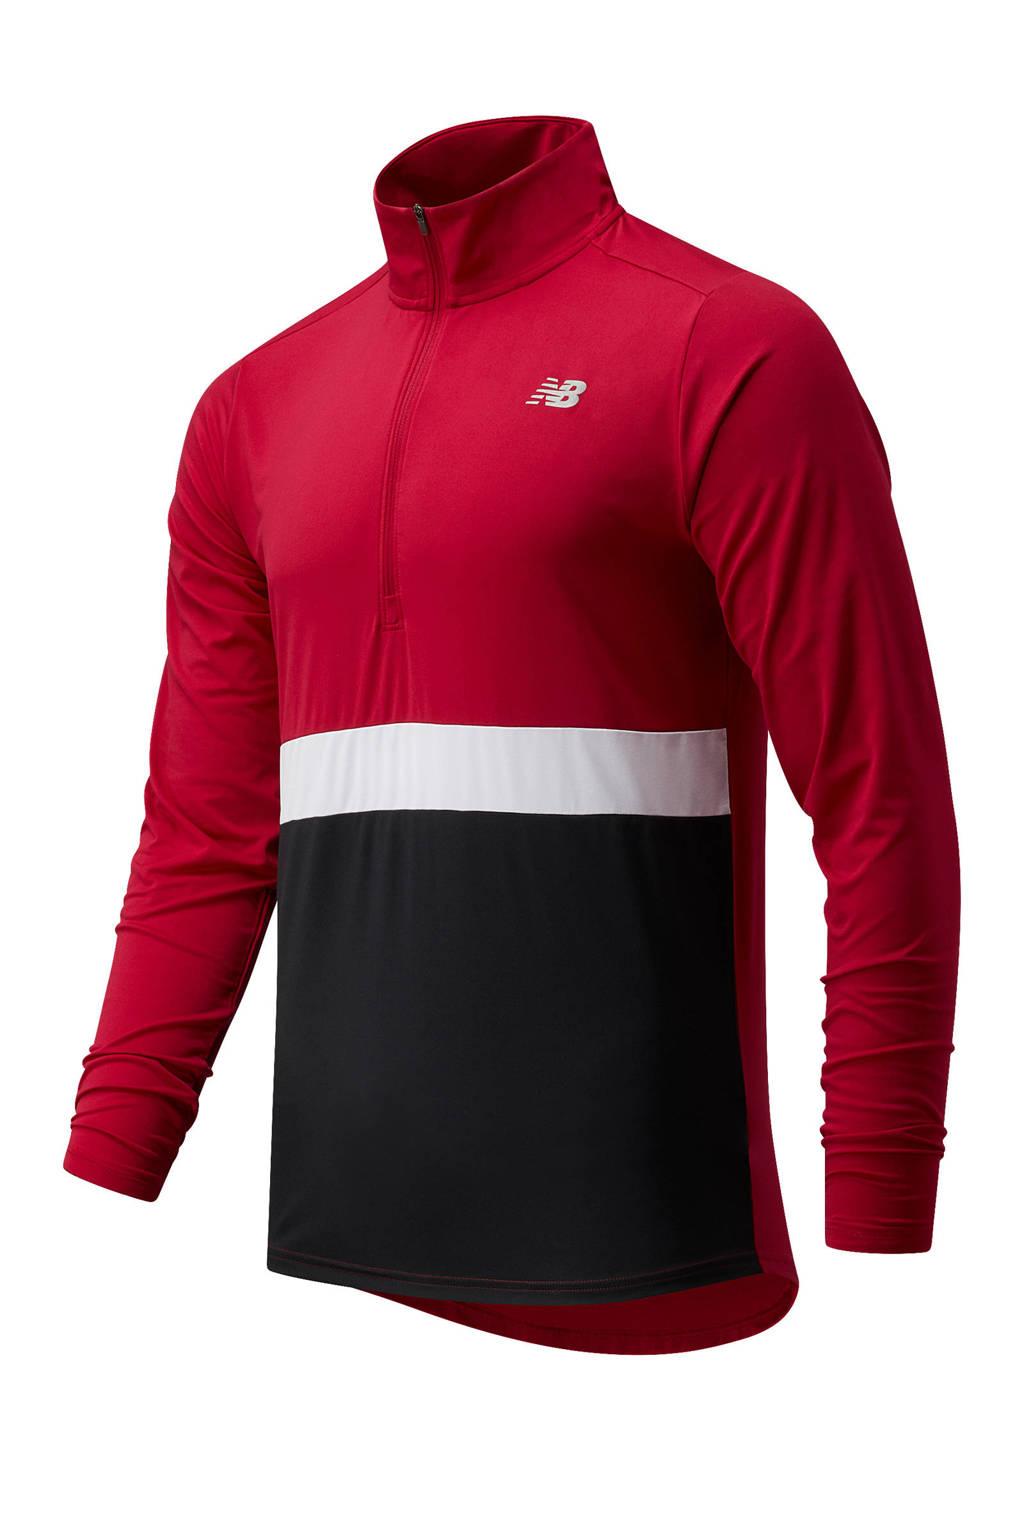 New Balance   hardloopshirt Accelerate rood/wit/zwart, Rood/wit/zwart